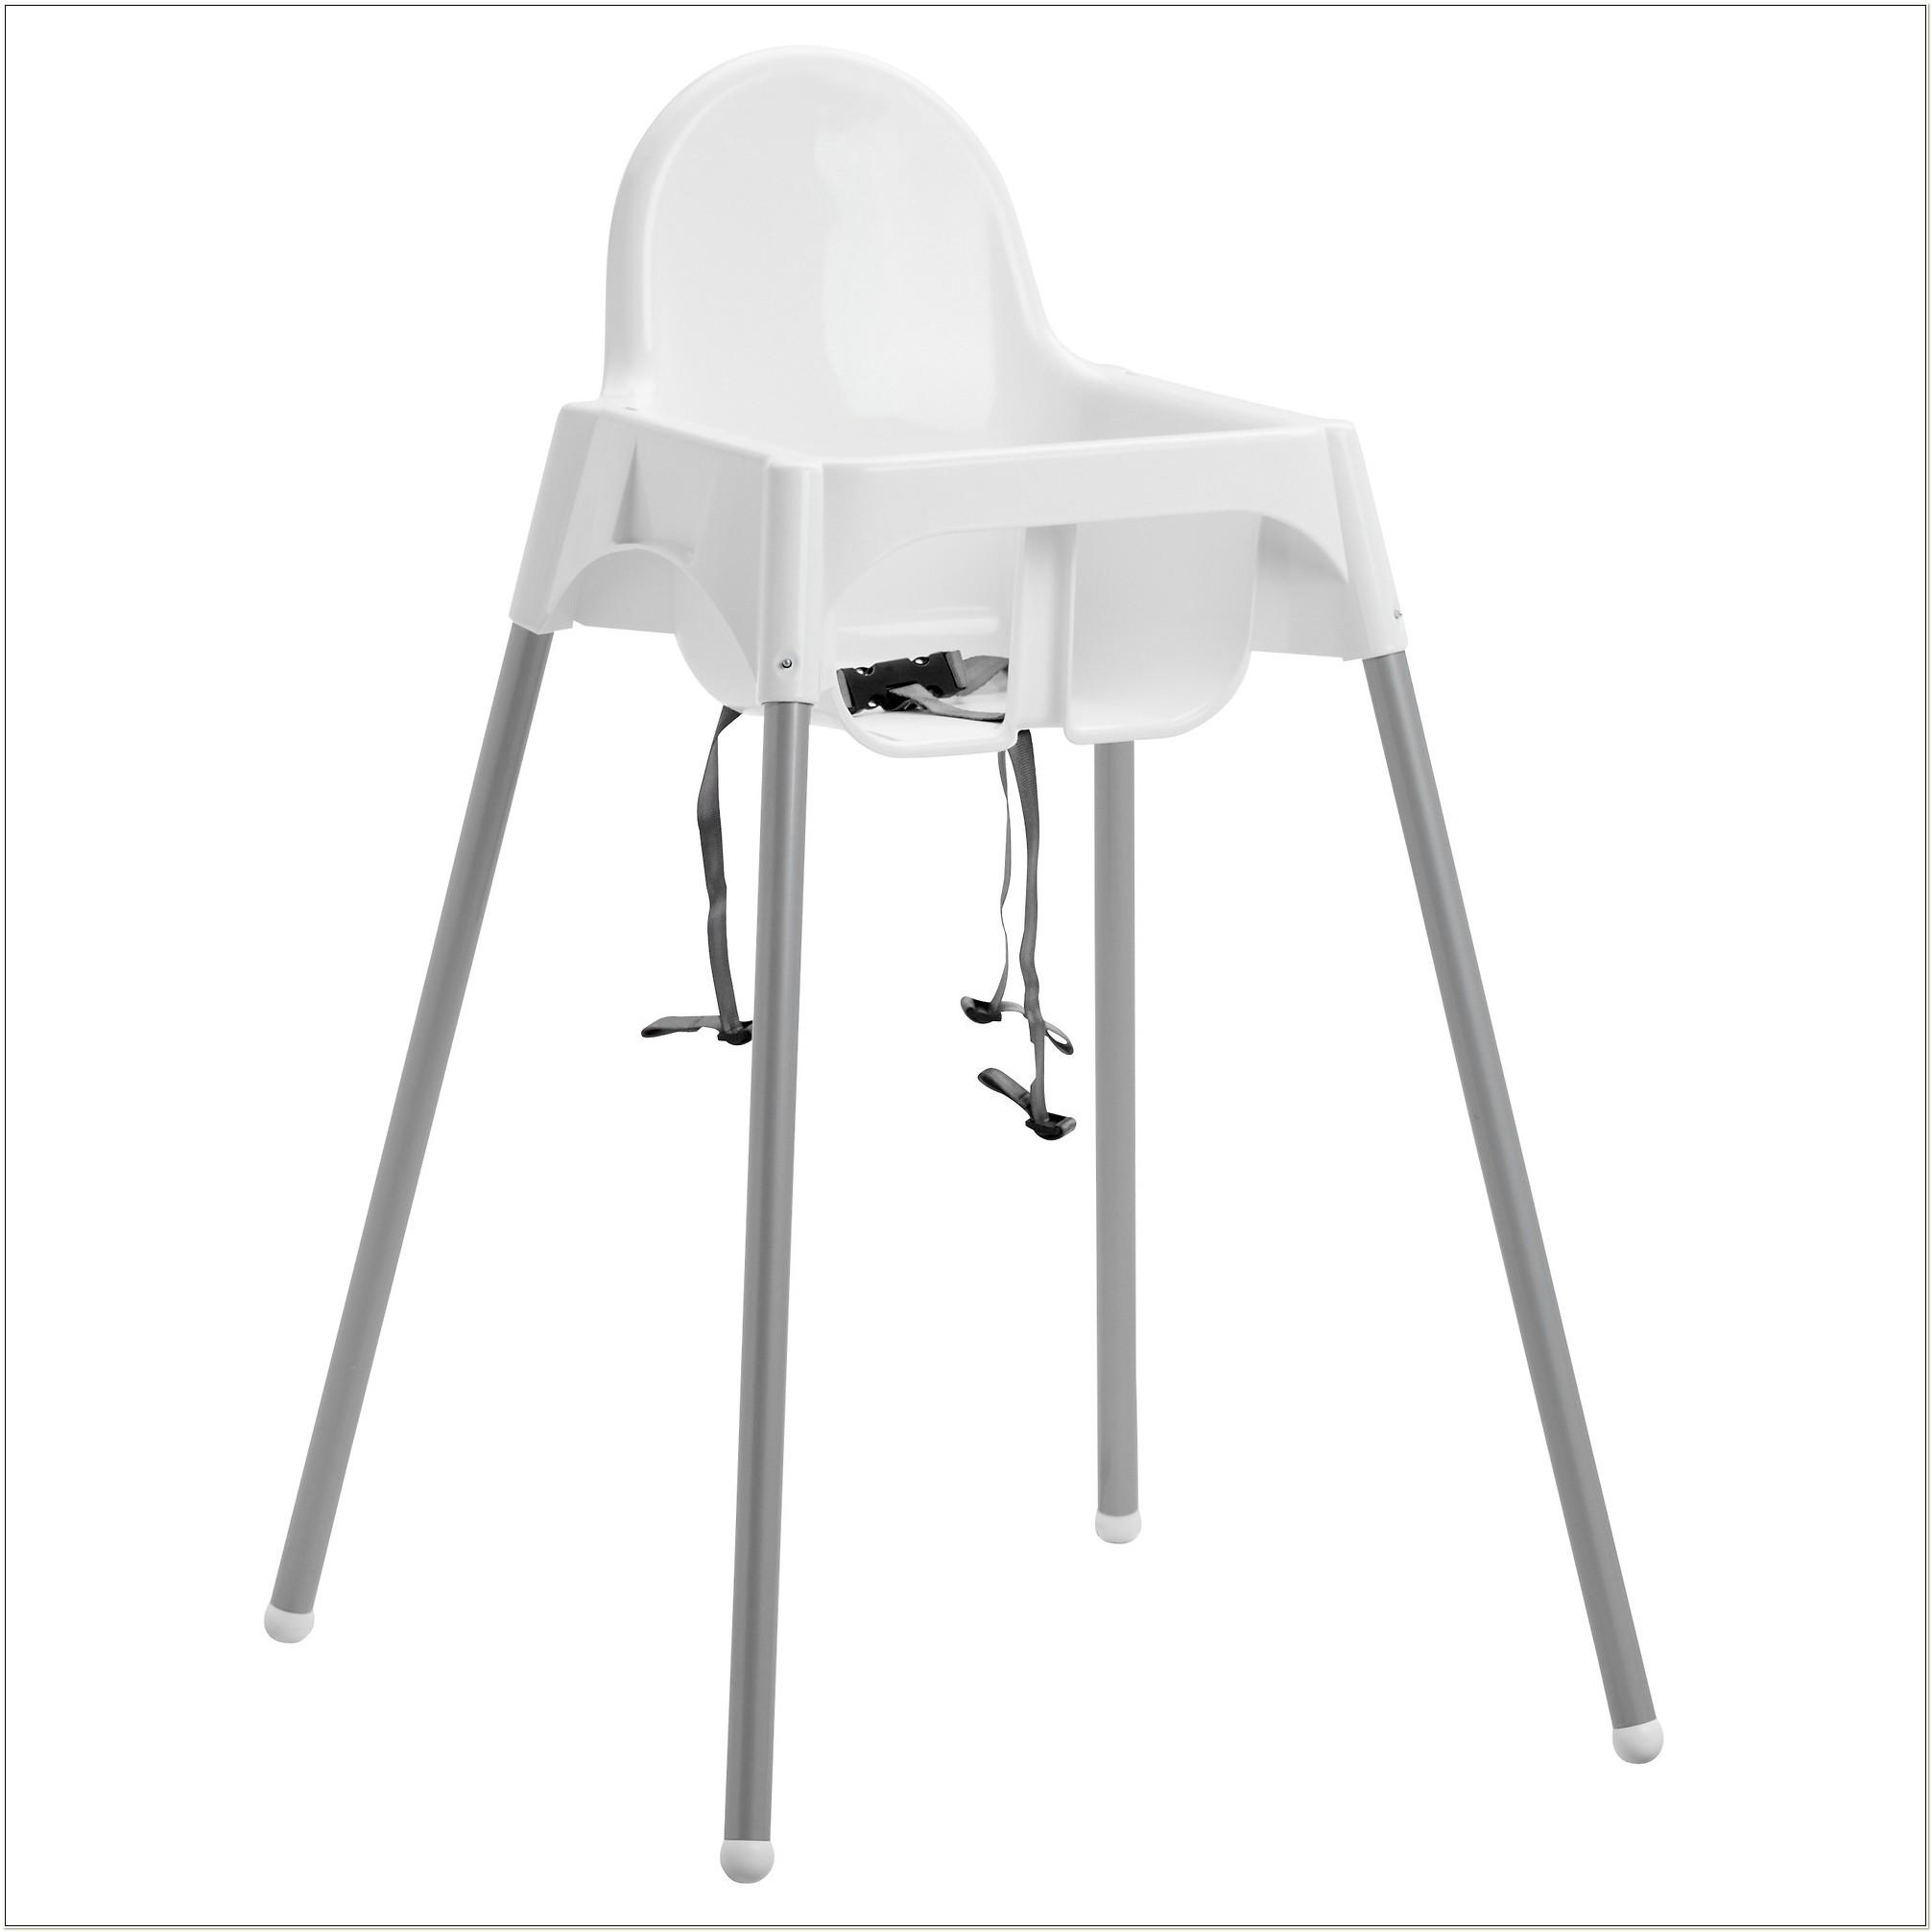 Ebay Ikea Baby High Chair